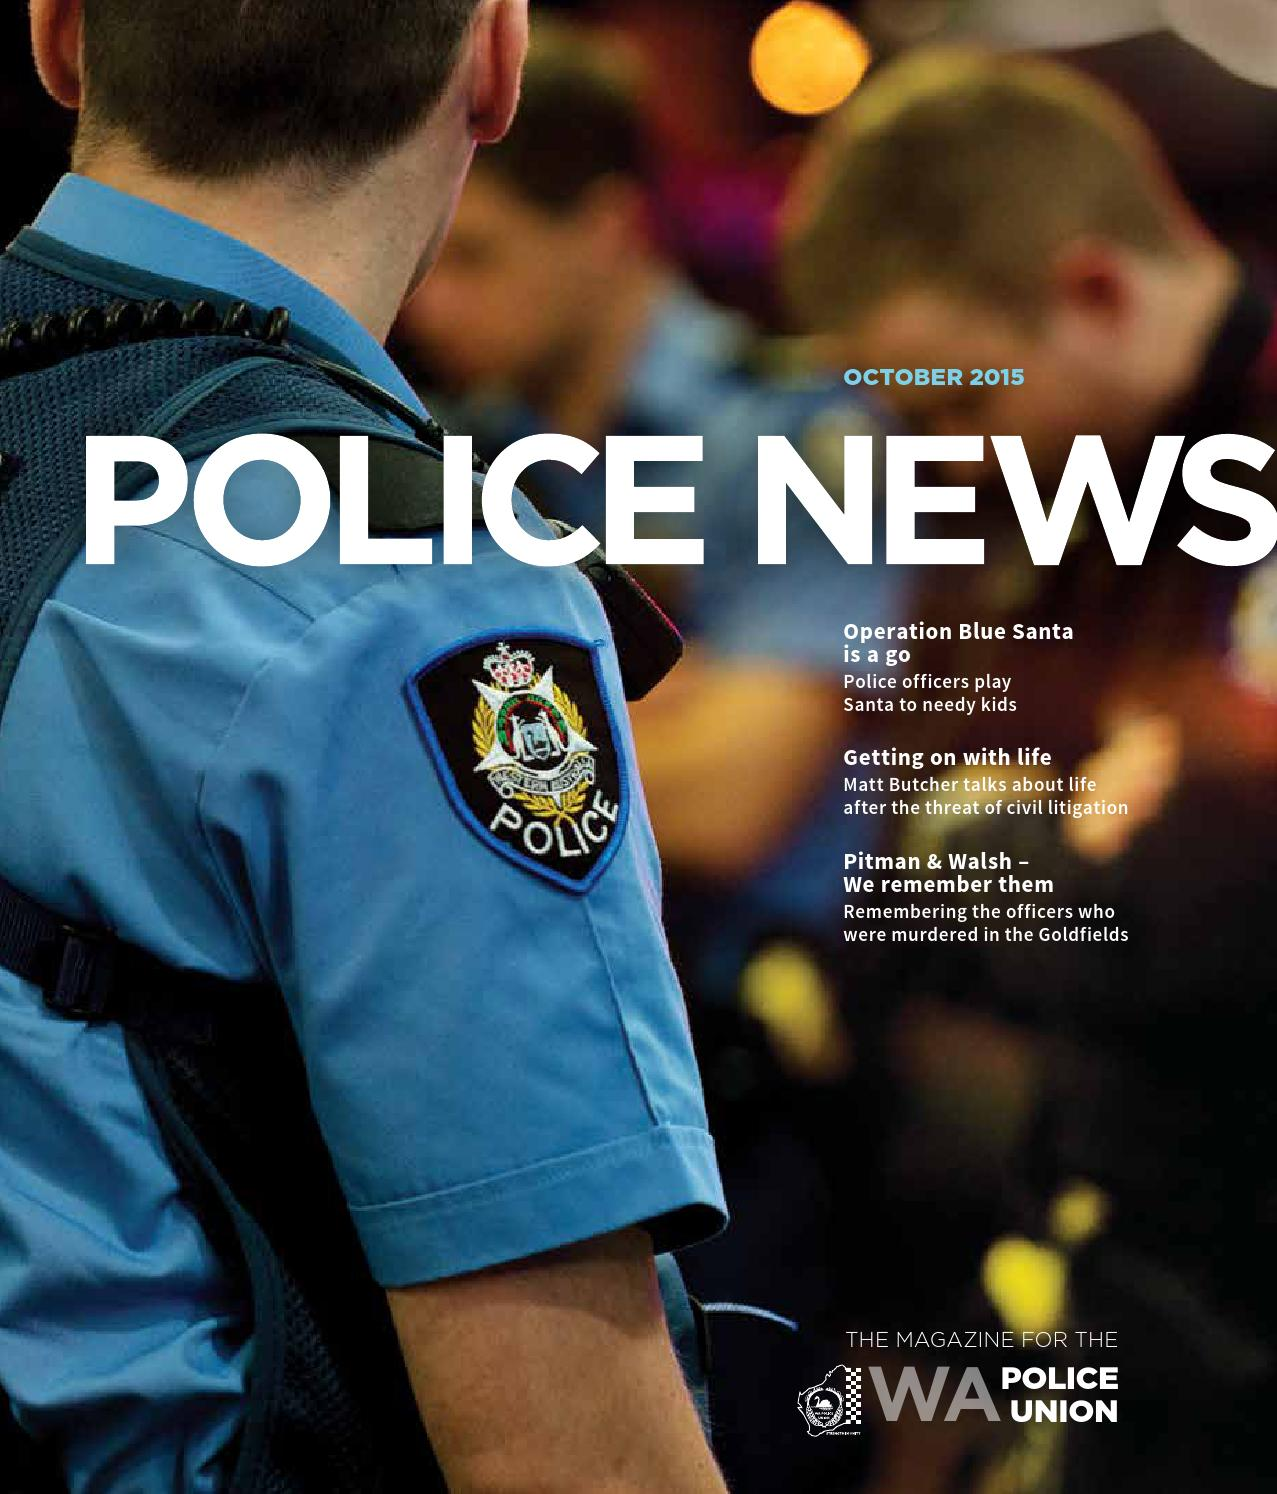 WAPU Police News October 2015 by WA Police Union - issuu